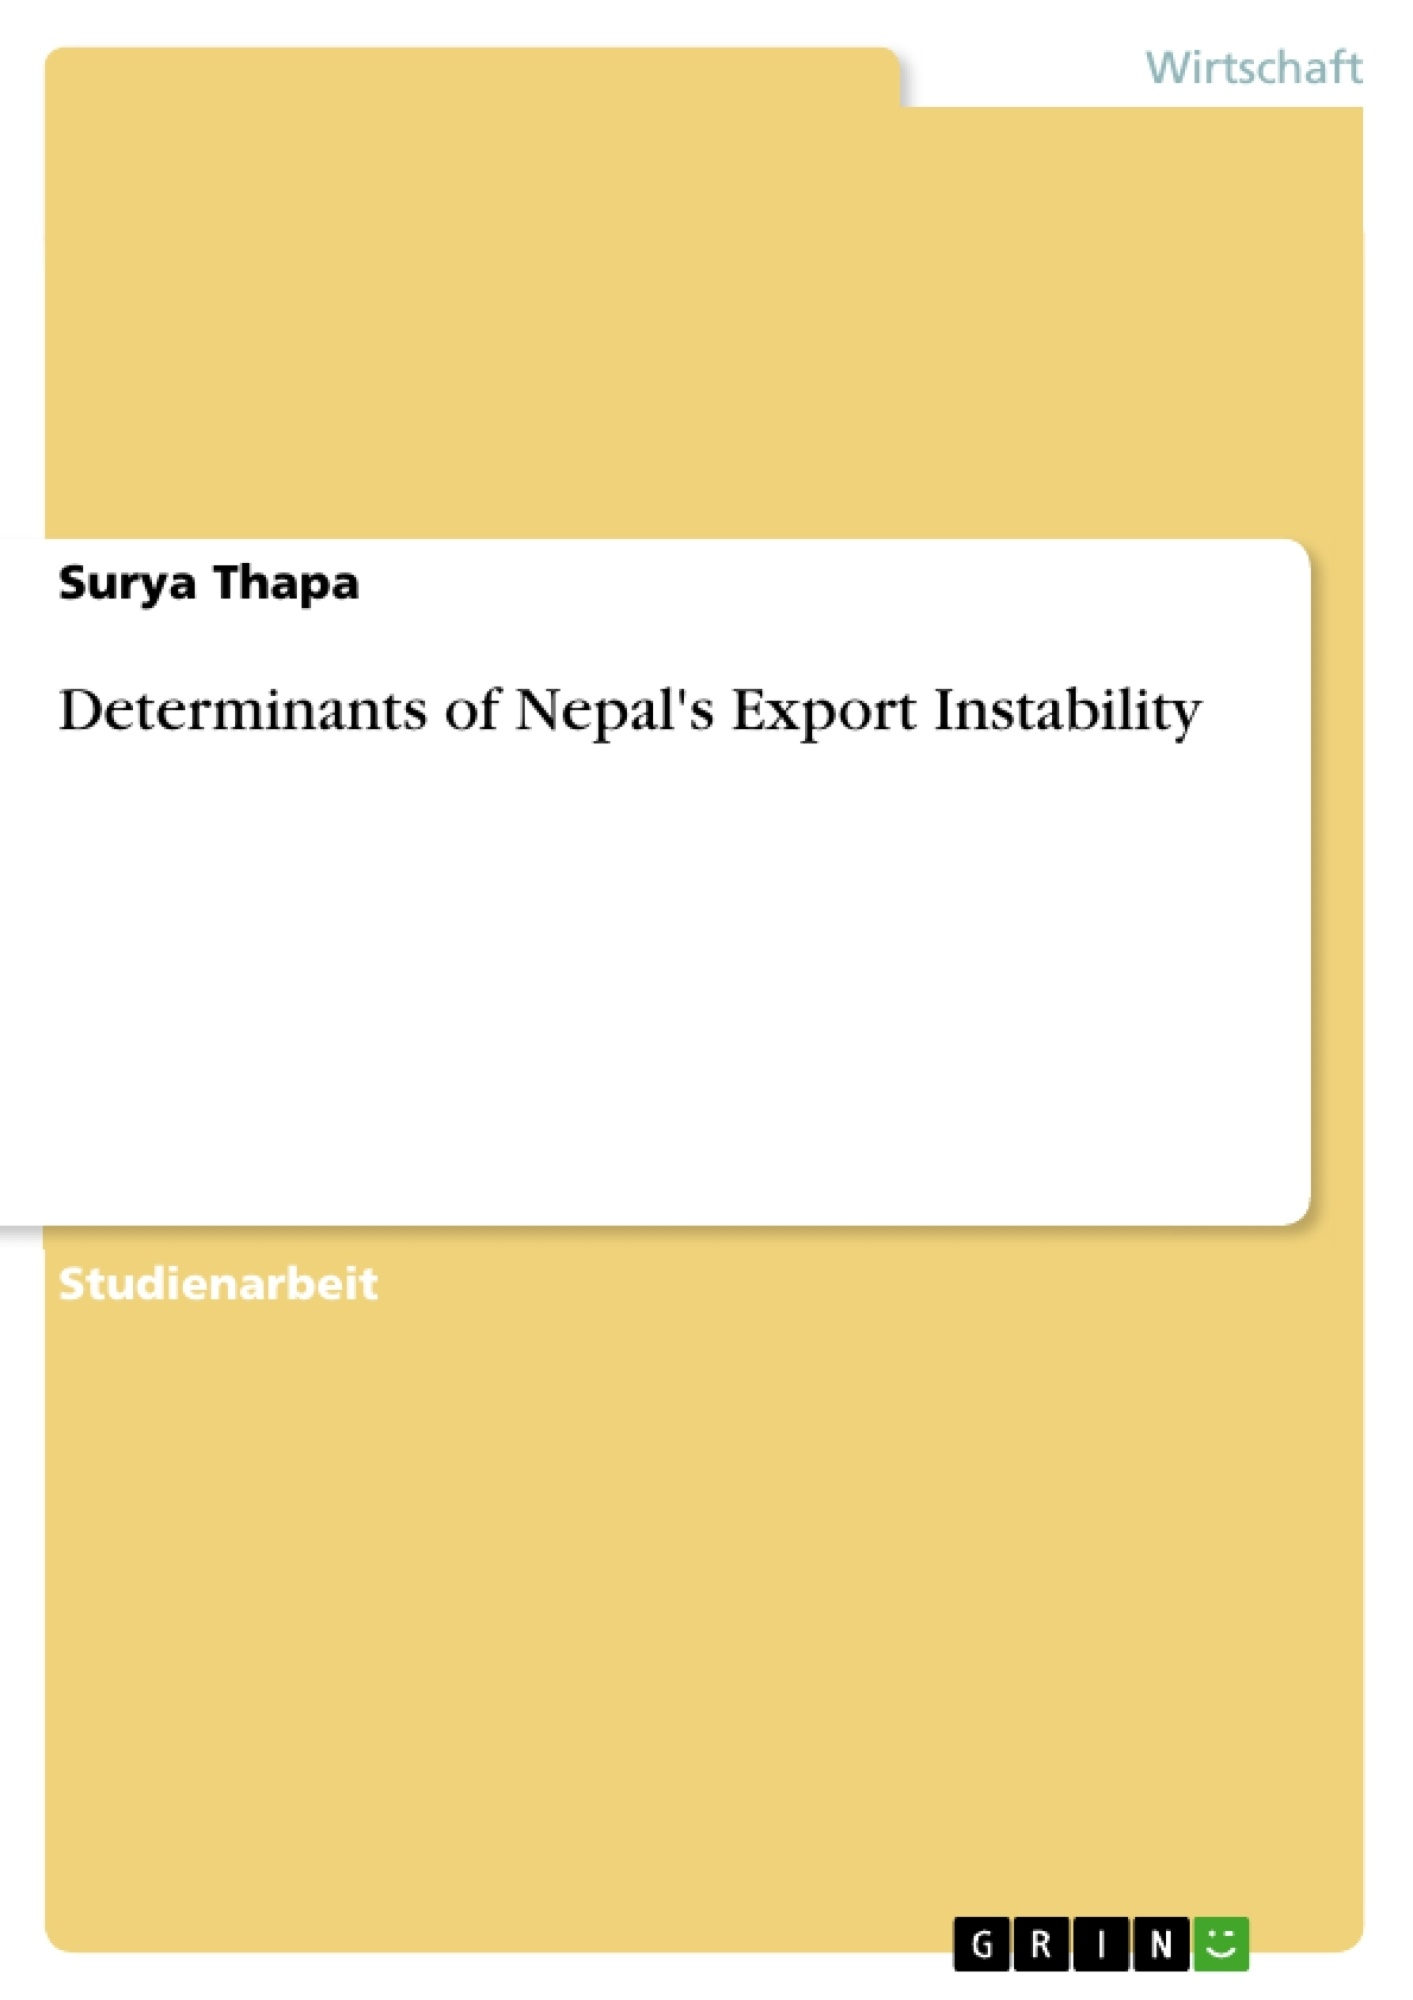 Titel: Determinants of Nepal's Export Instability